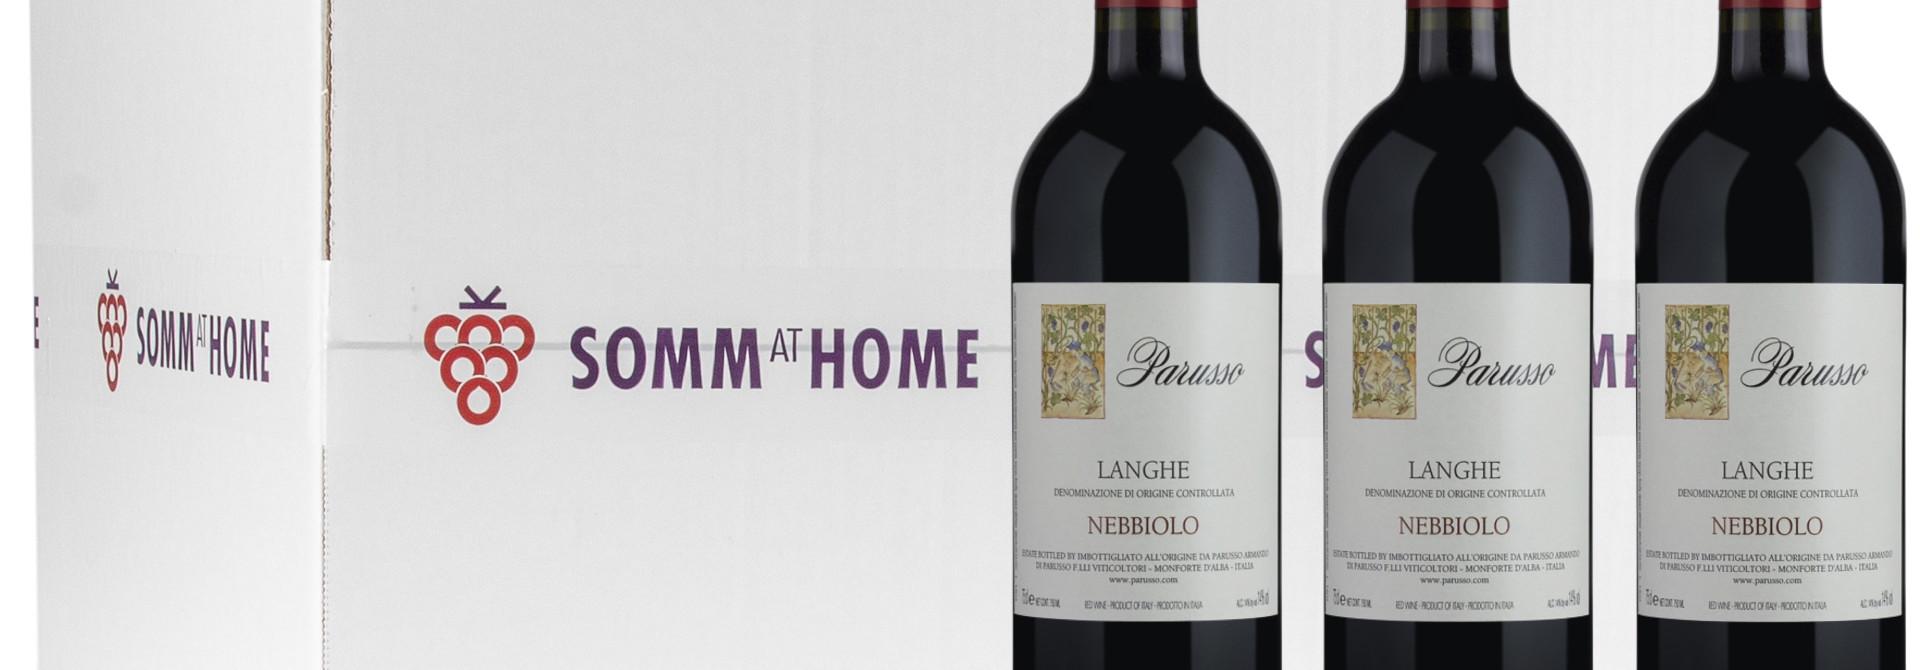 Parusso, Langhe Nebbiolo 2019 (3 fl)